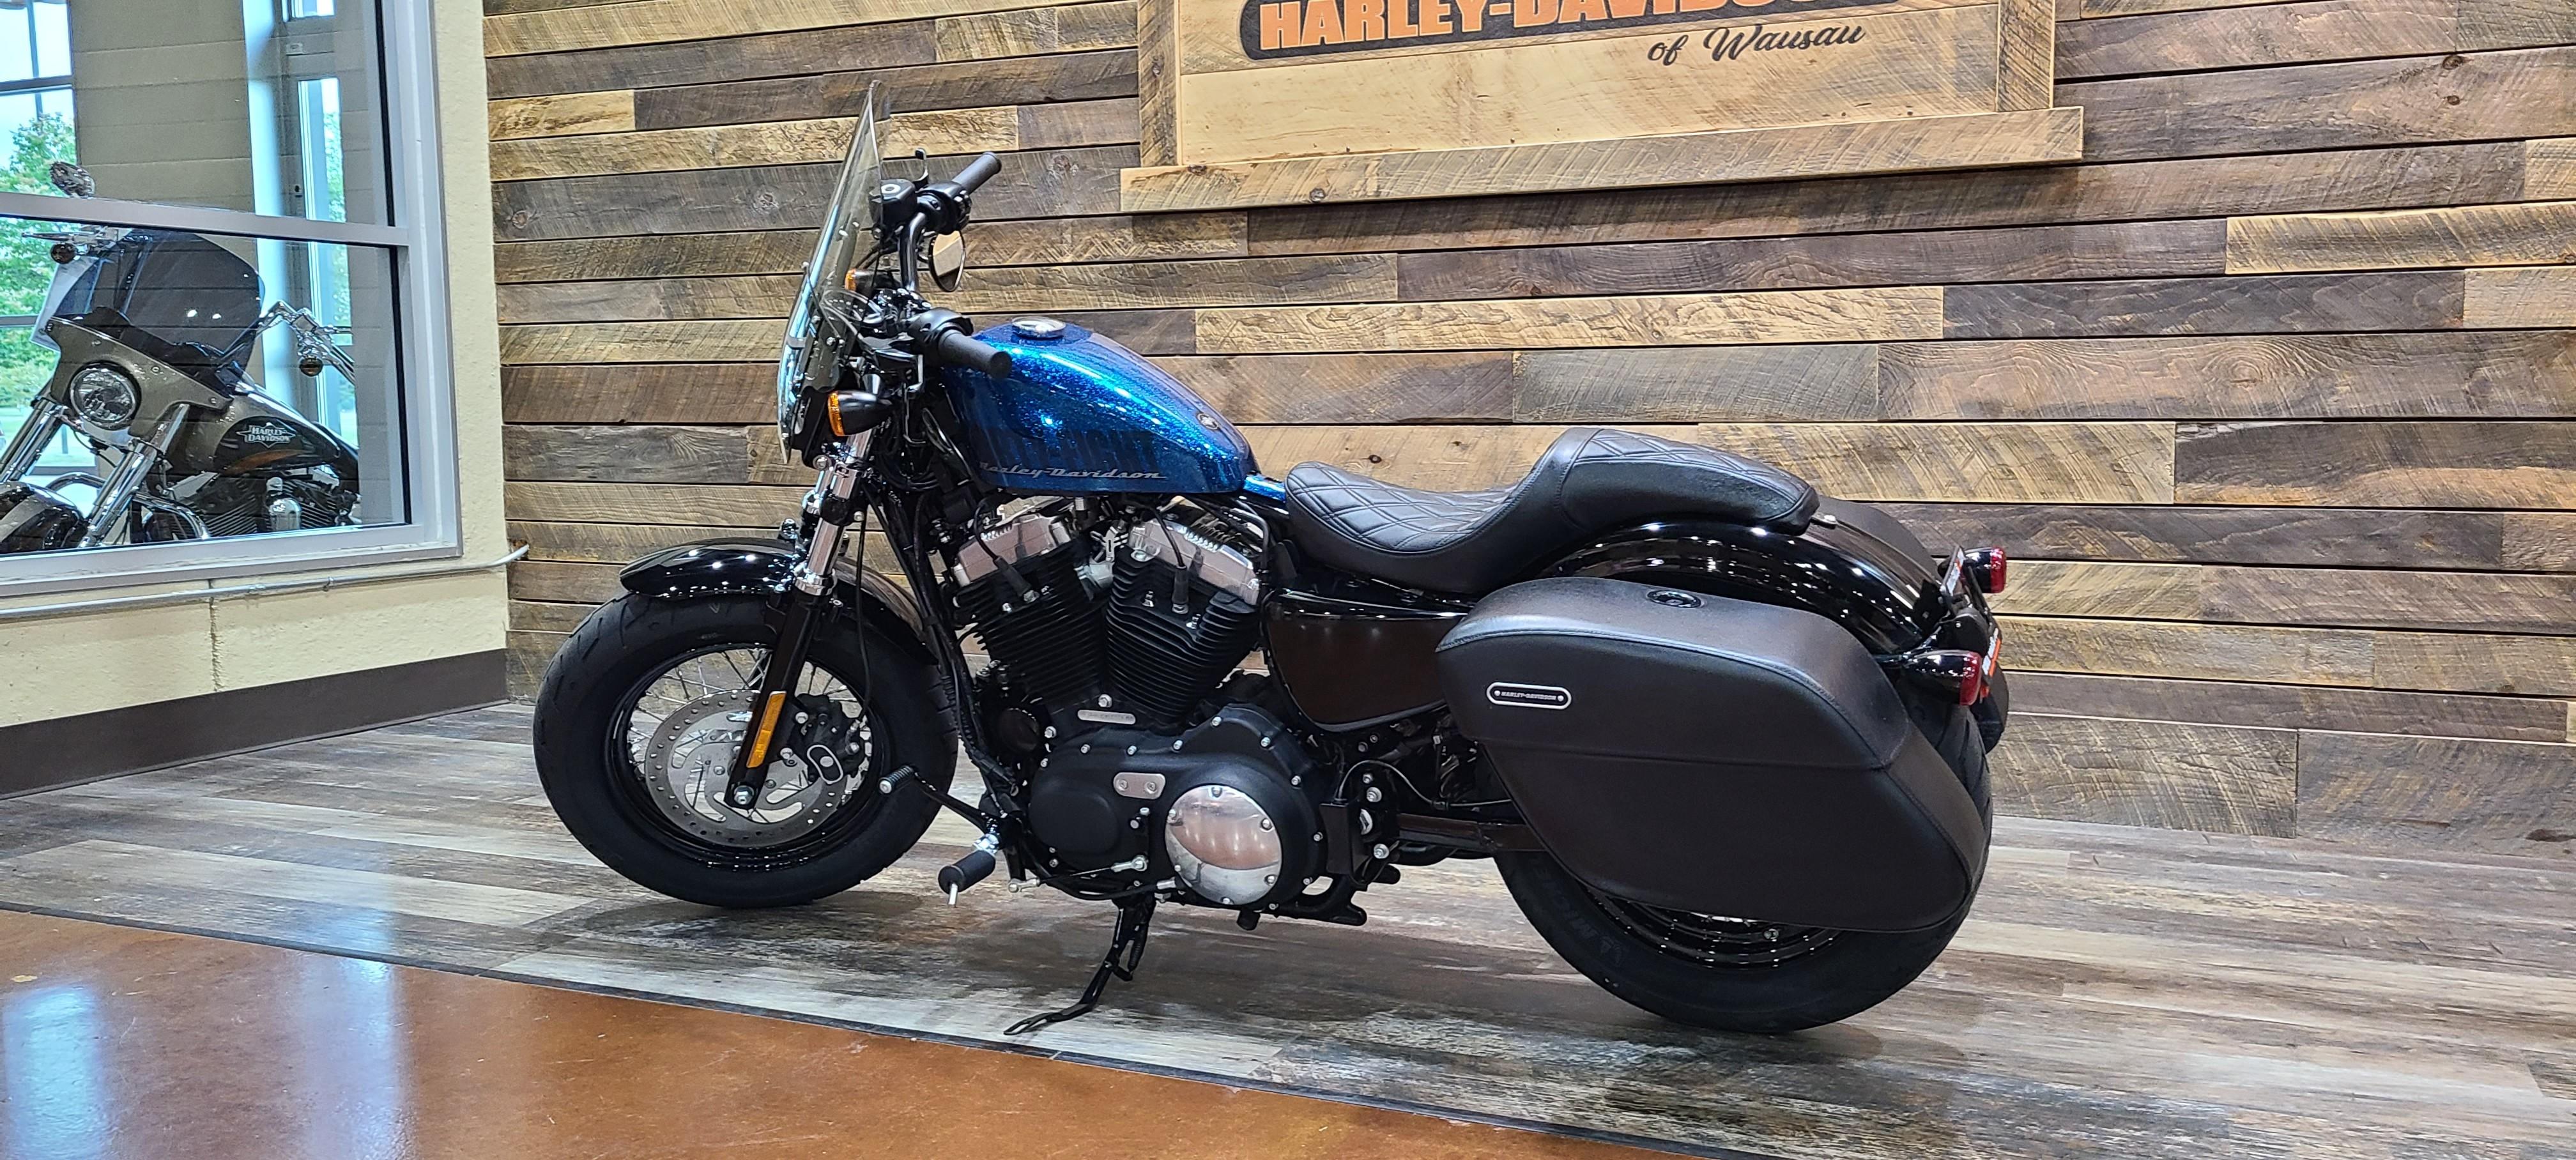 2015 Harley-Davidson Sportster Forty-Eight at Bull Falls Harley-Davidson